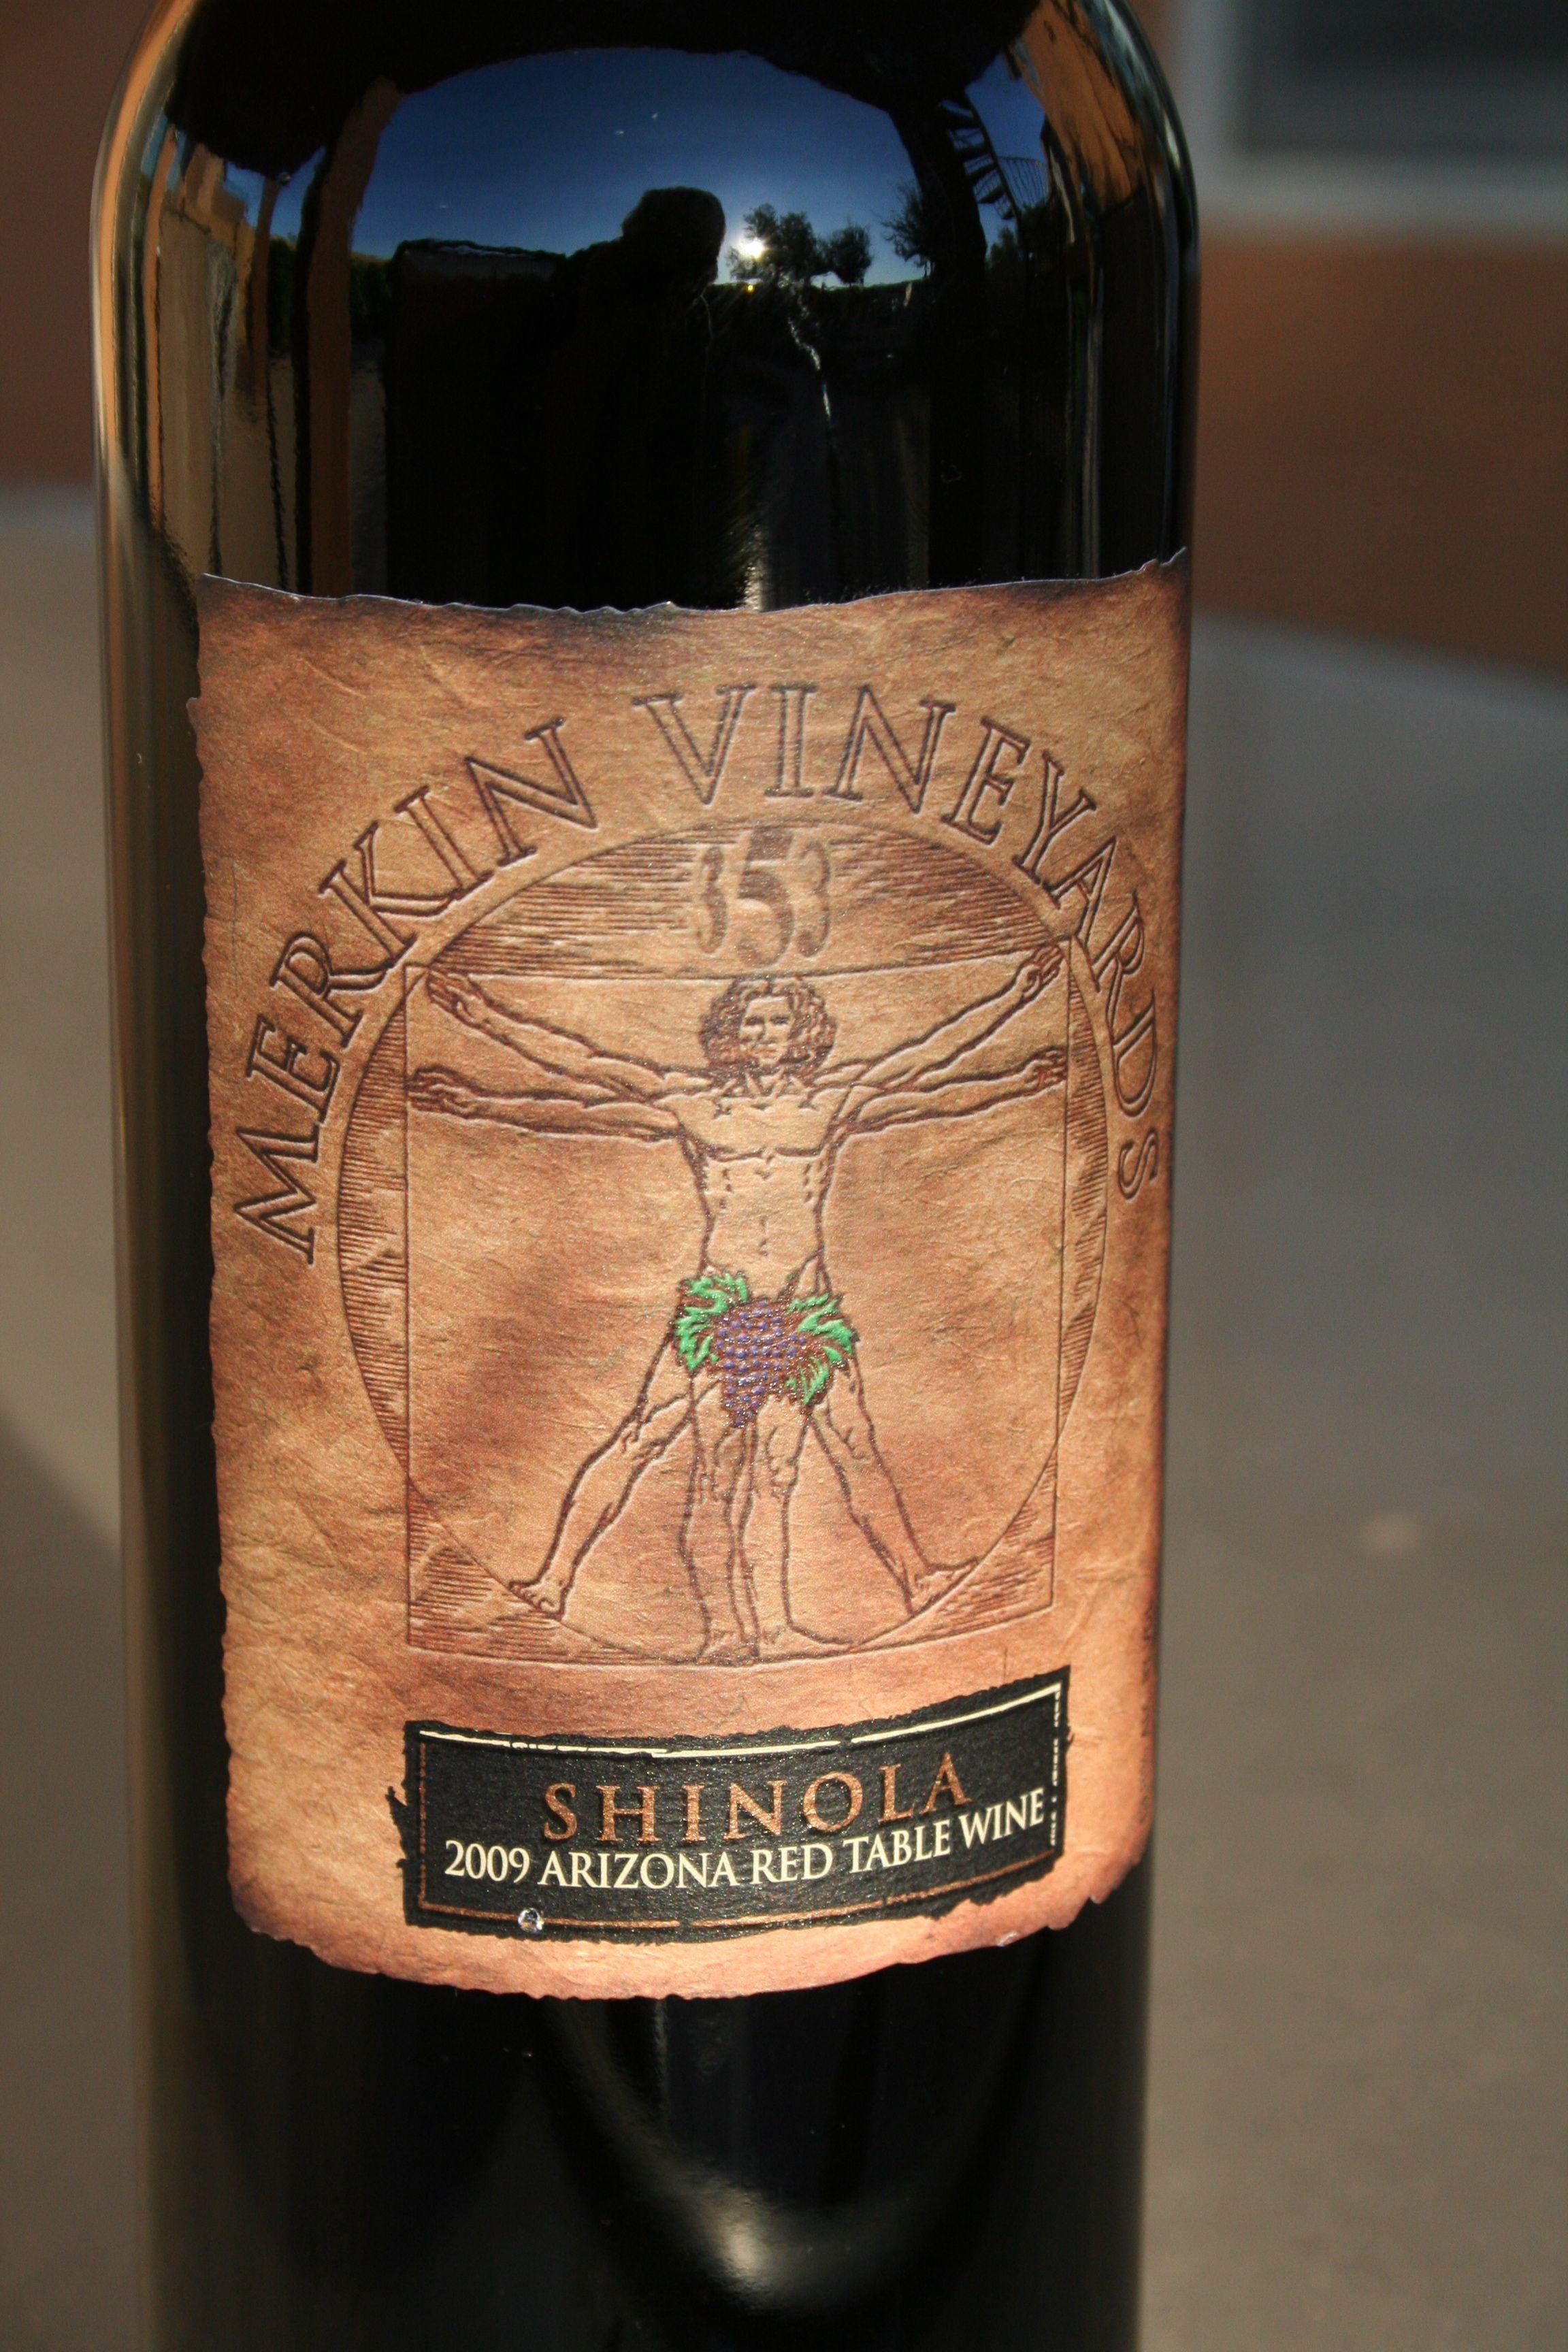 Yummy wine by Maynard Keenan, Arizona wine maker and lead